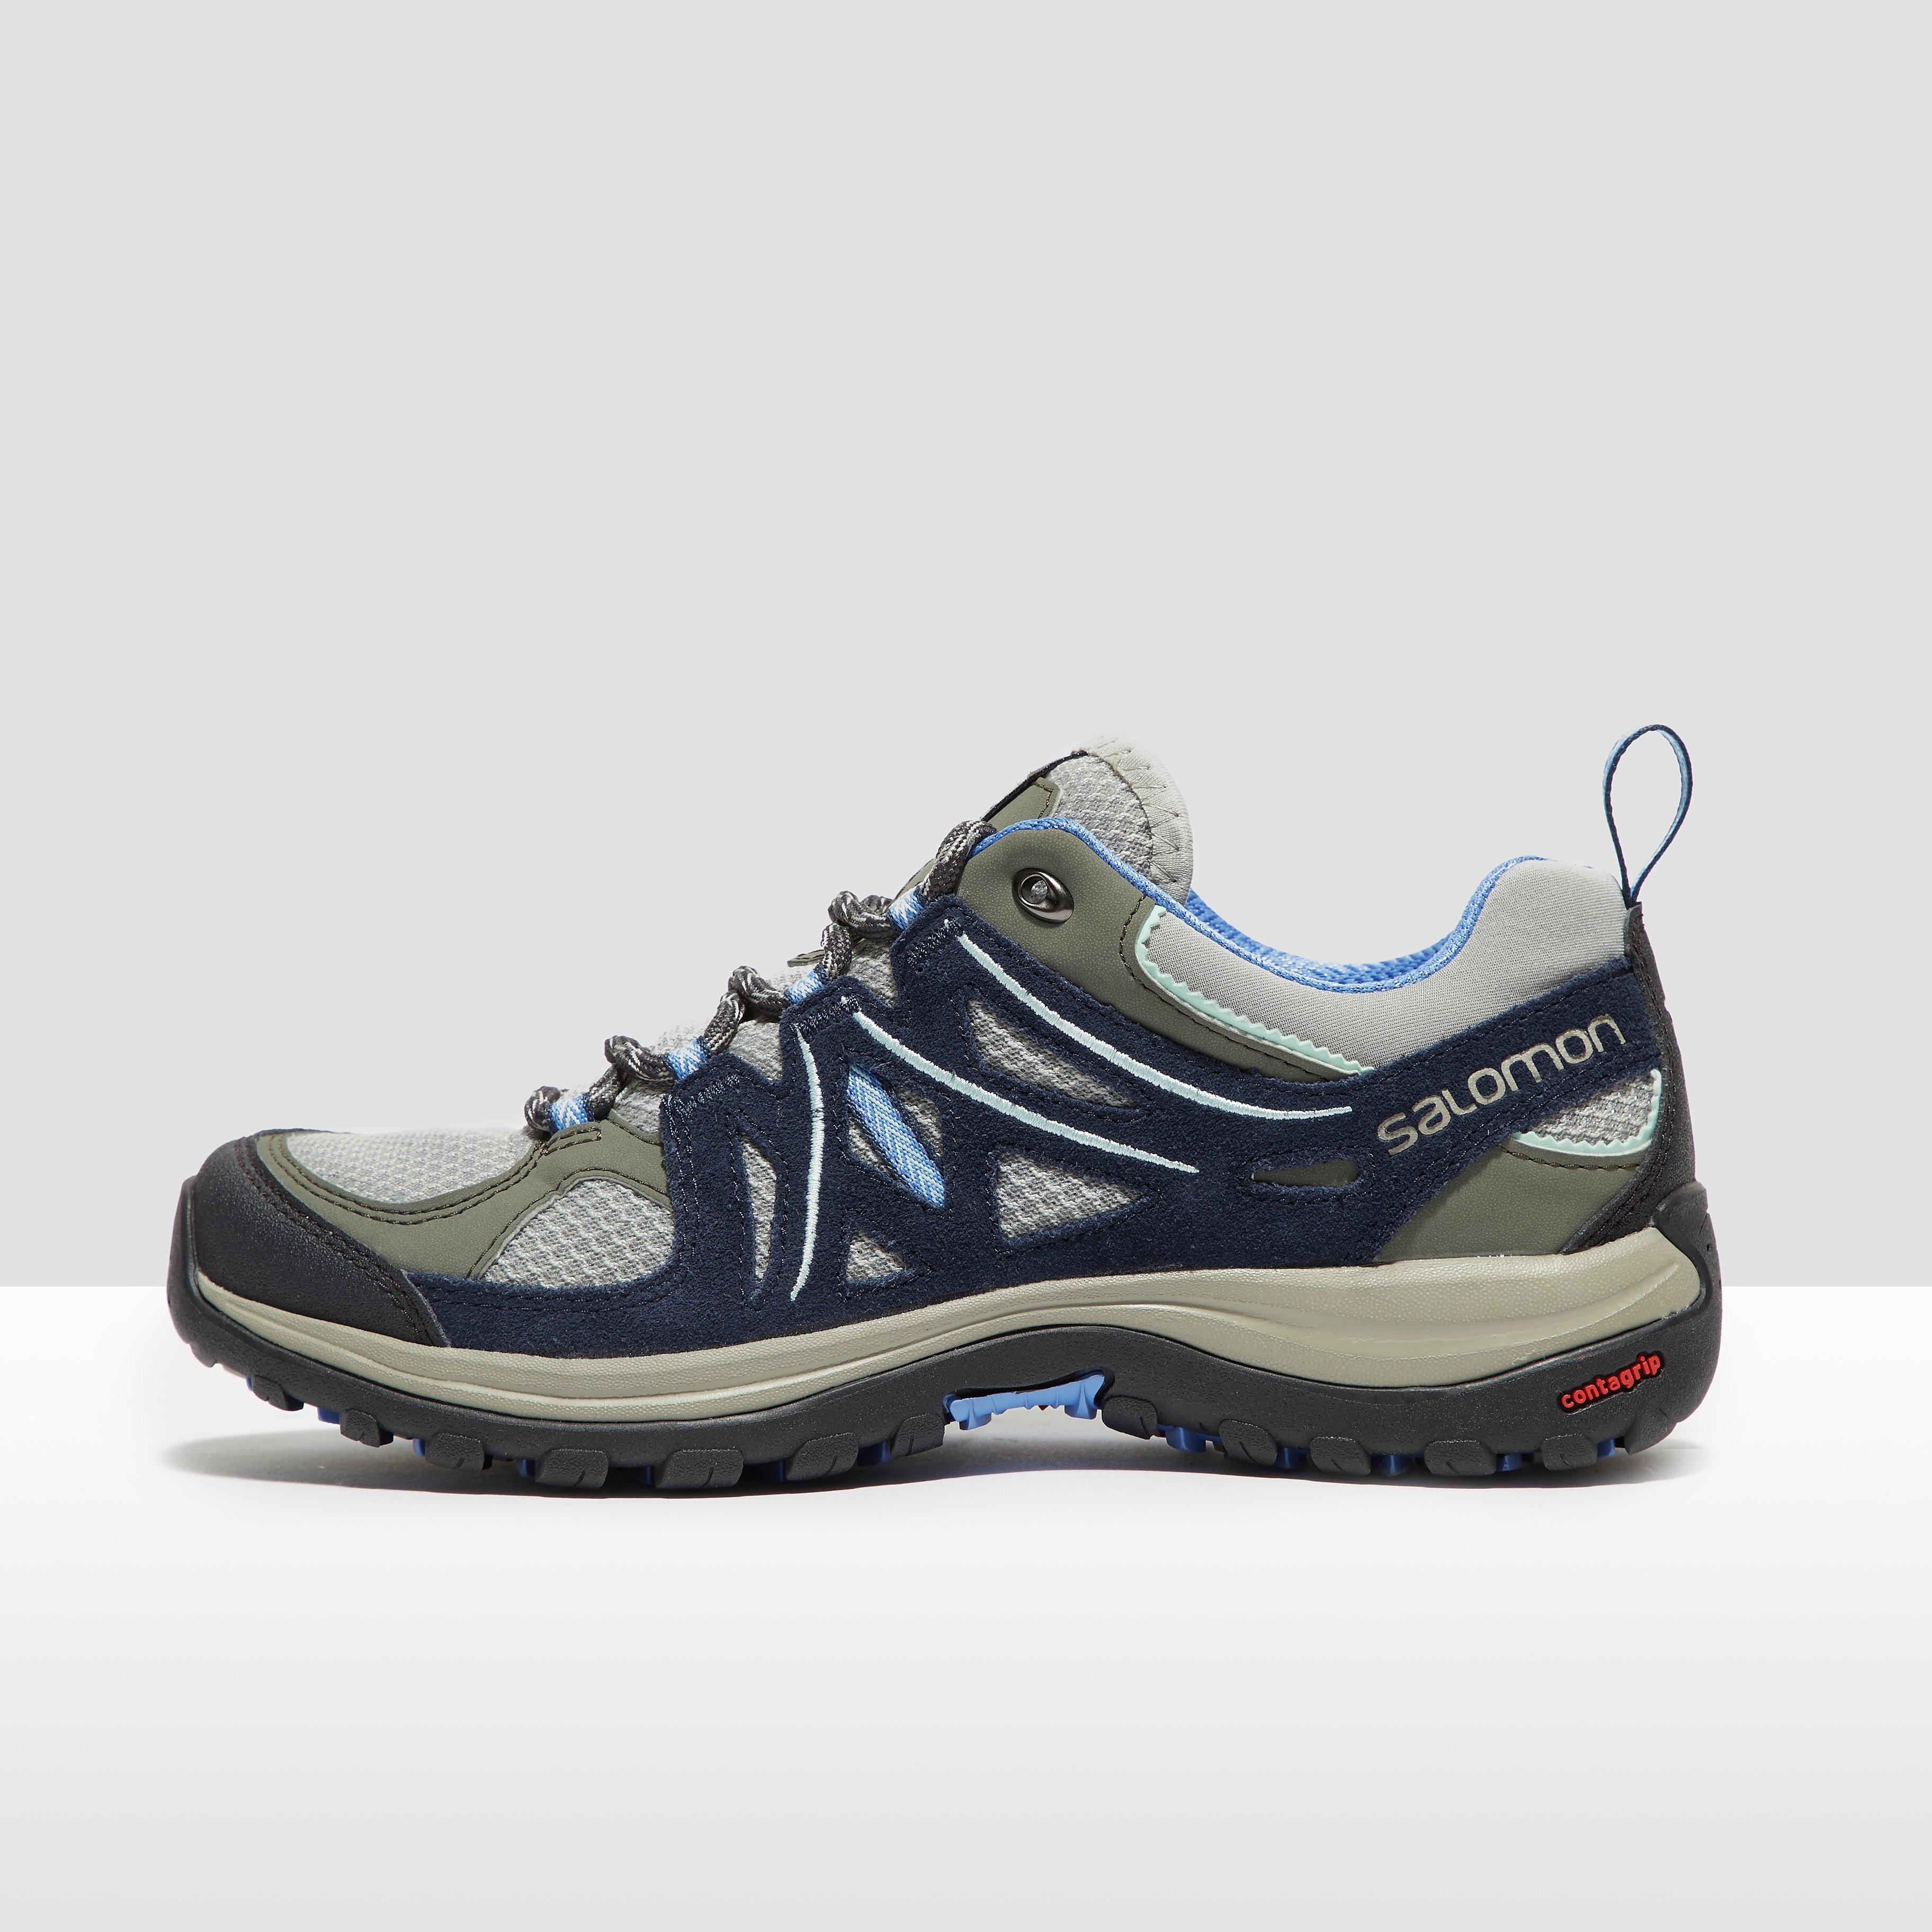 Salomon Ellipse 2 Aero Women's Walking Boots